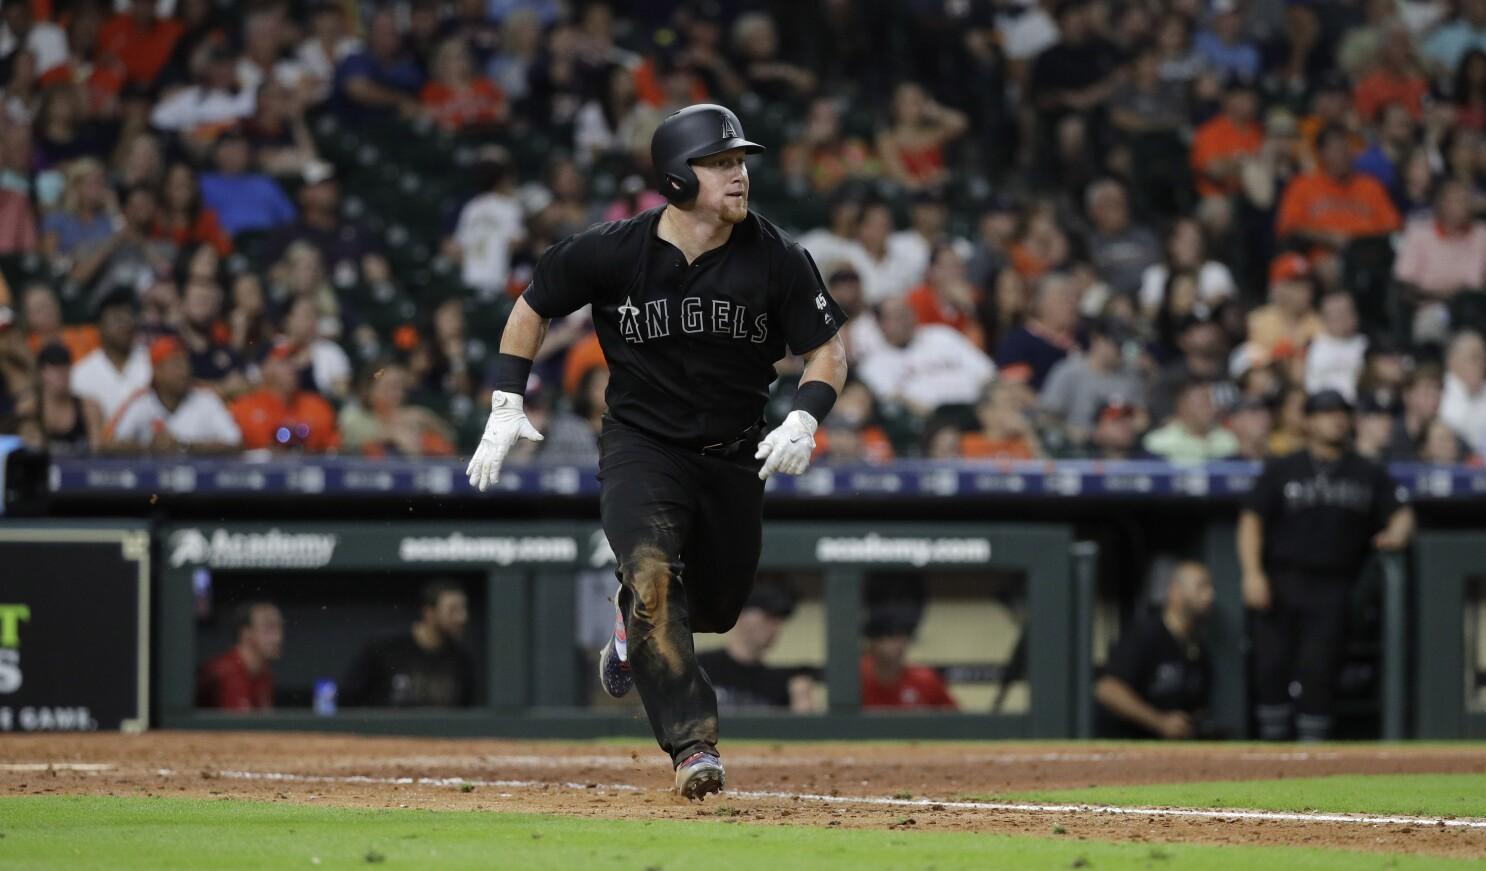 Angels fall short against Astros, losing fourth straight